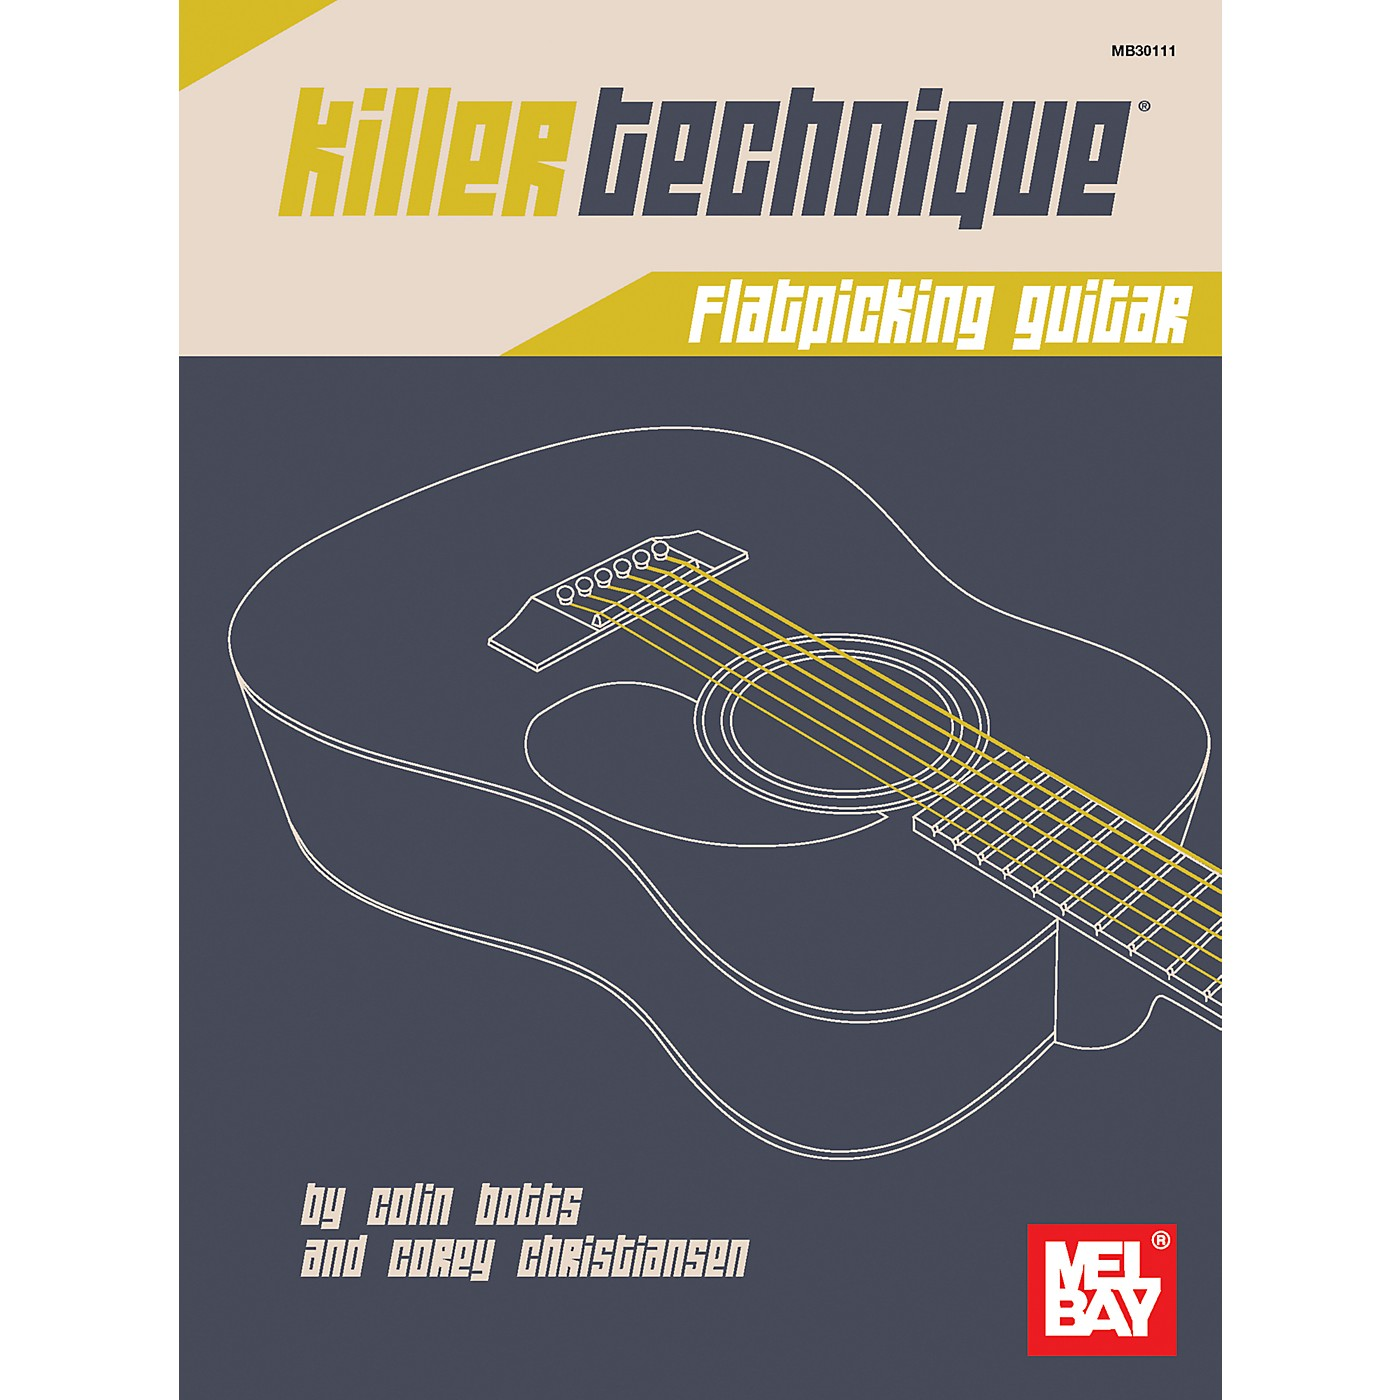 Mel Bay Killer Technique: Flatpicking Guitar thumbnail